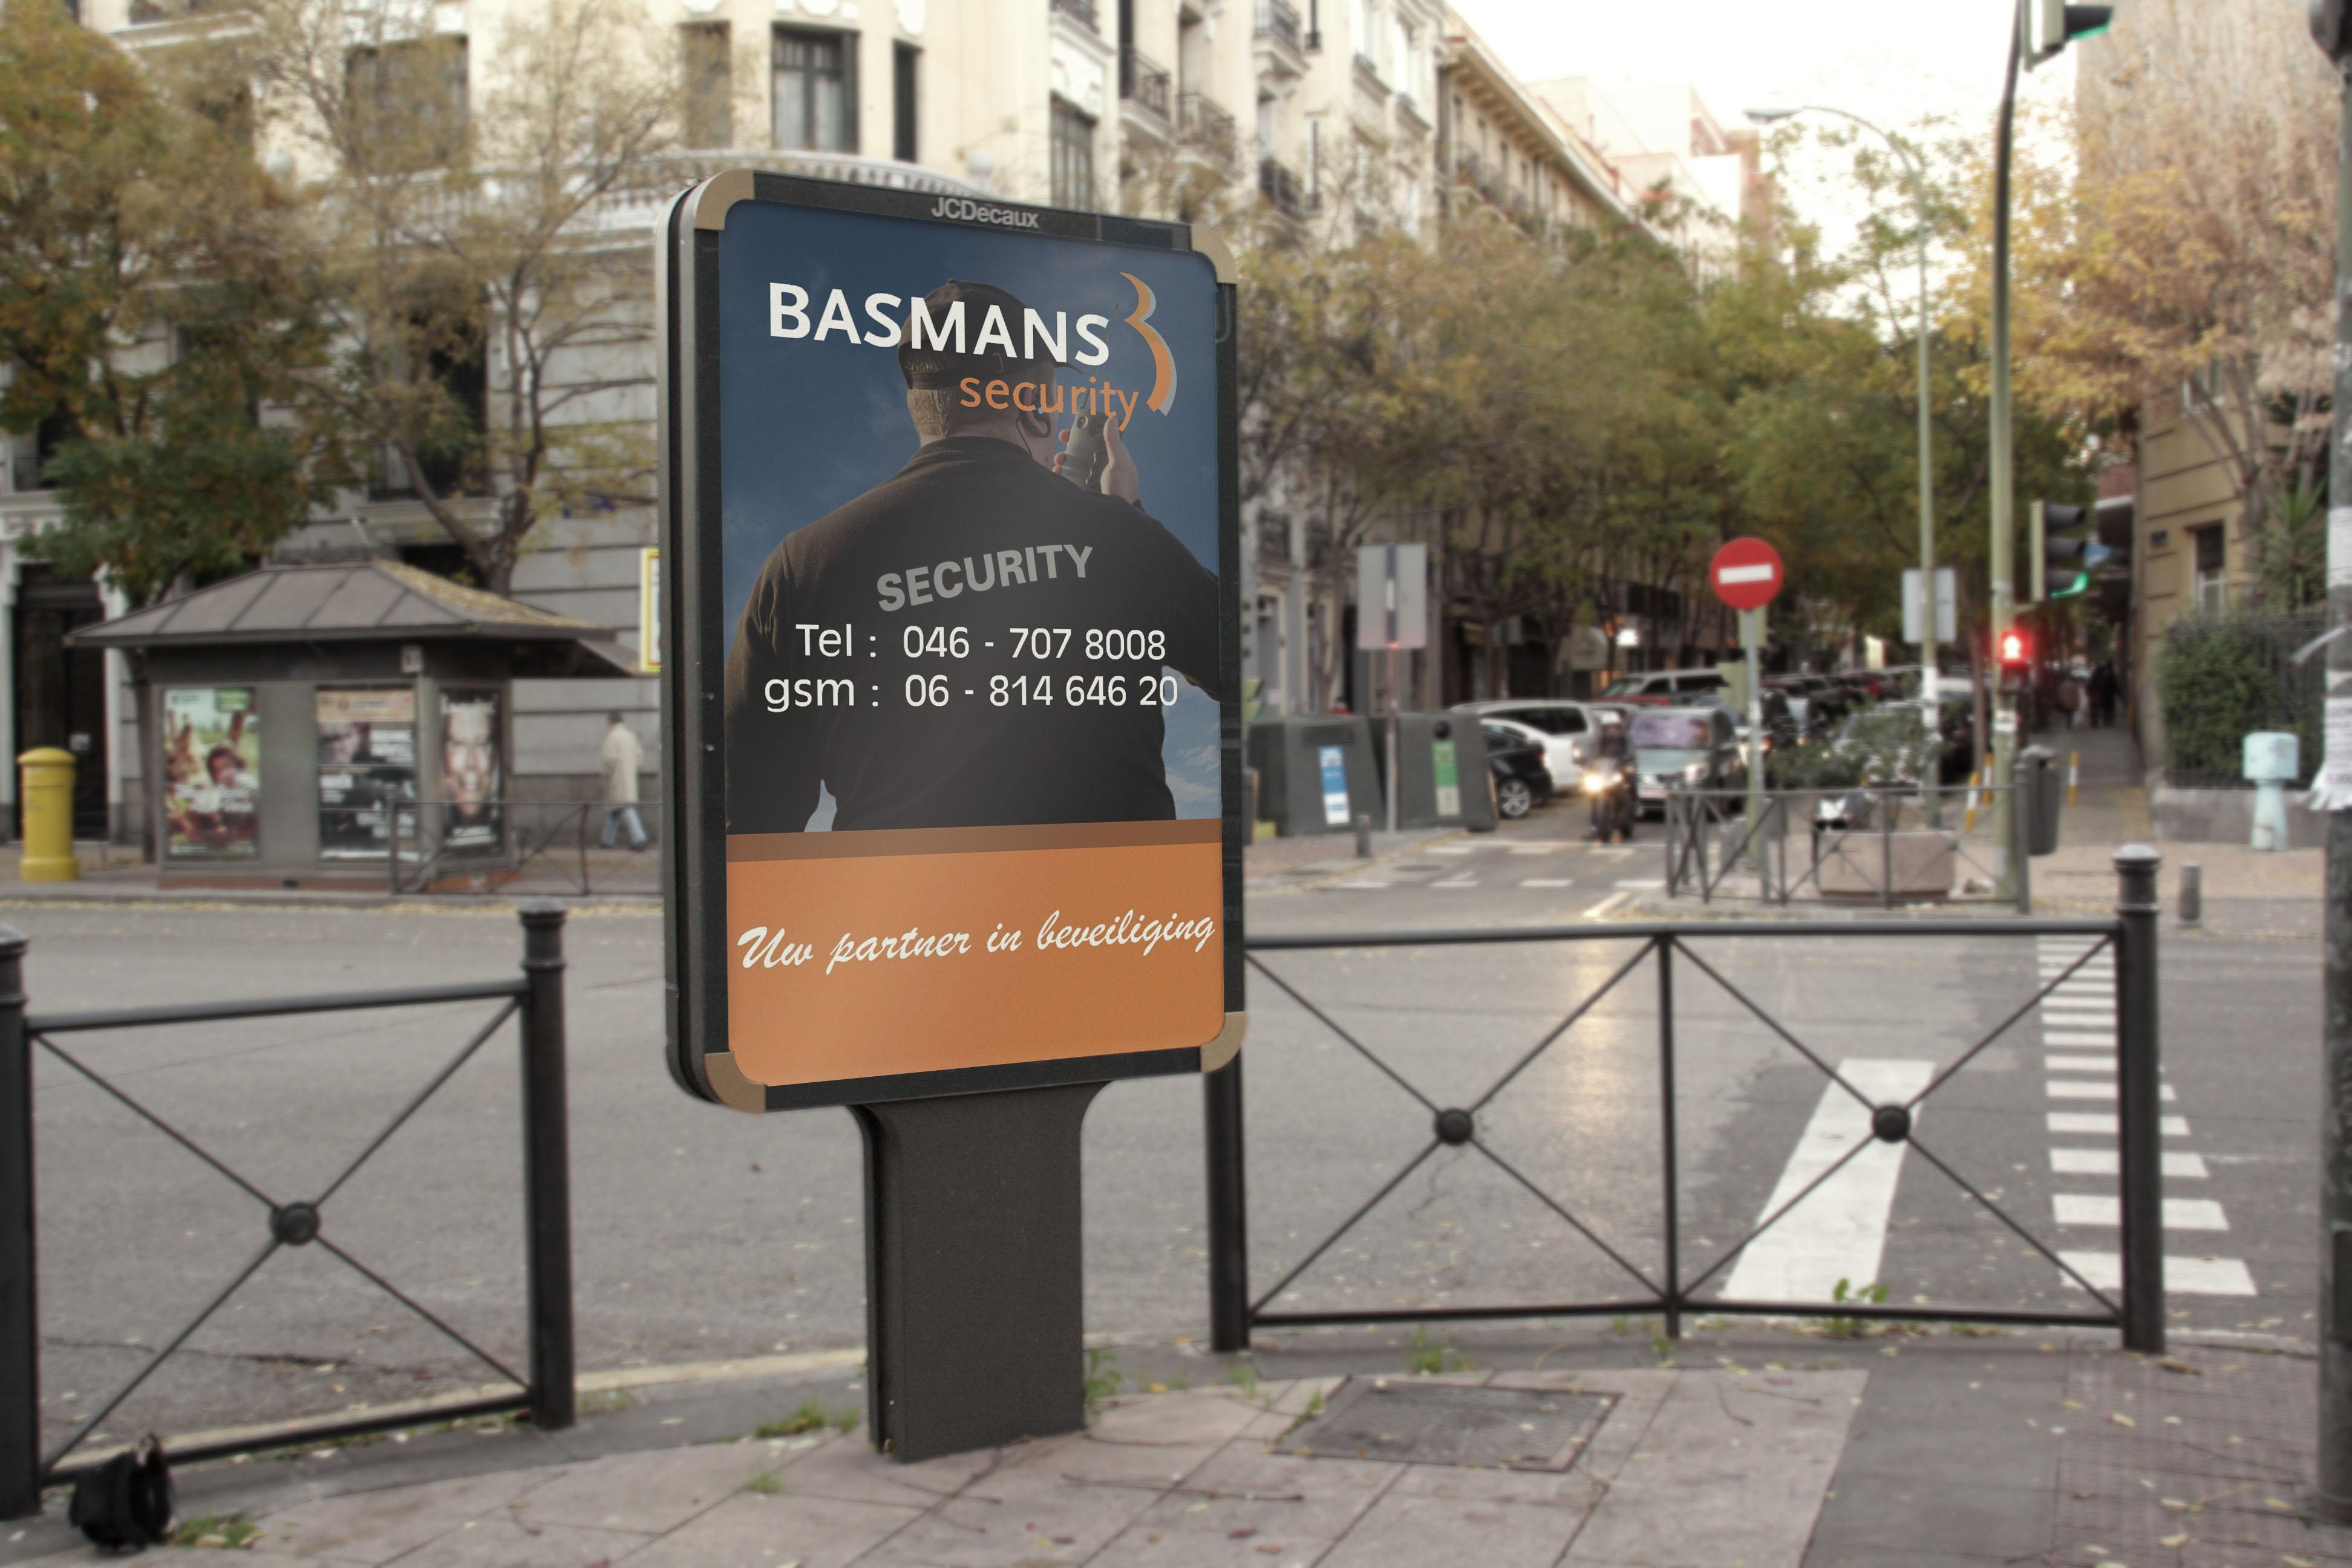 Basmans-Security